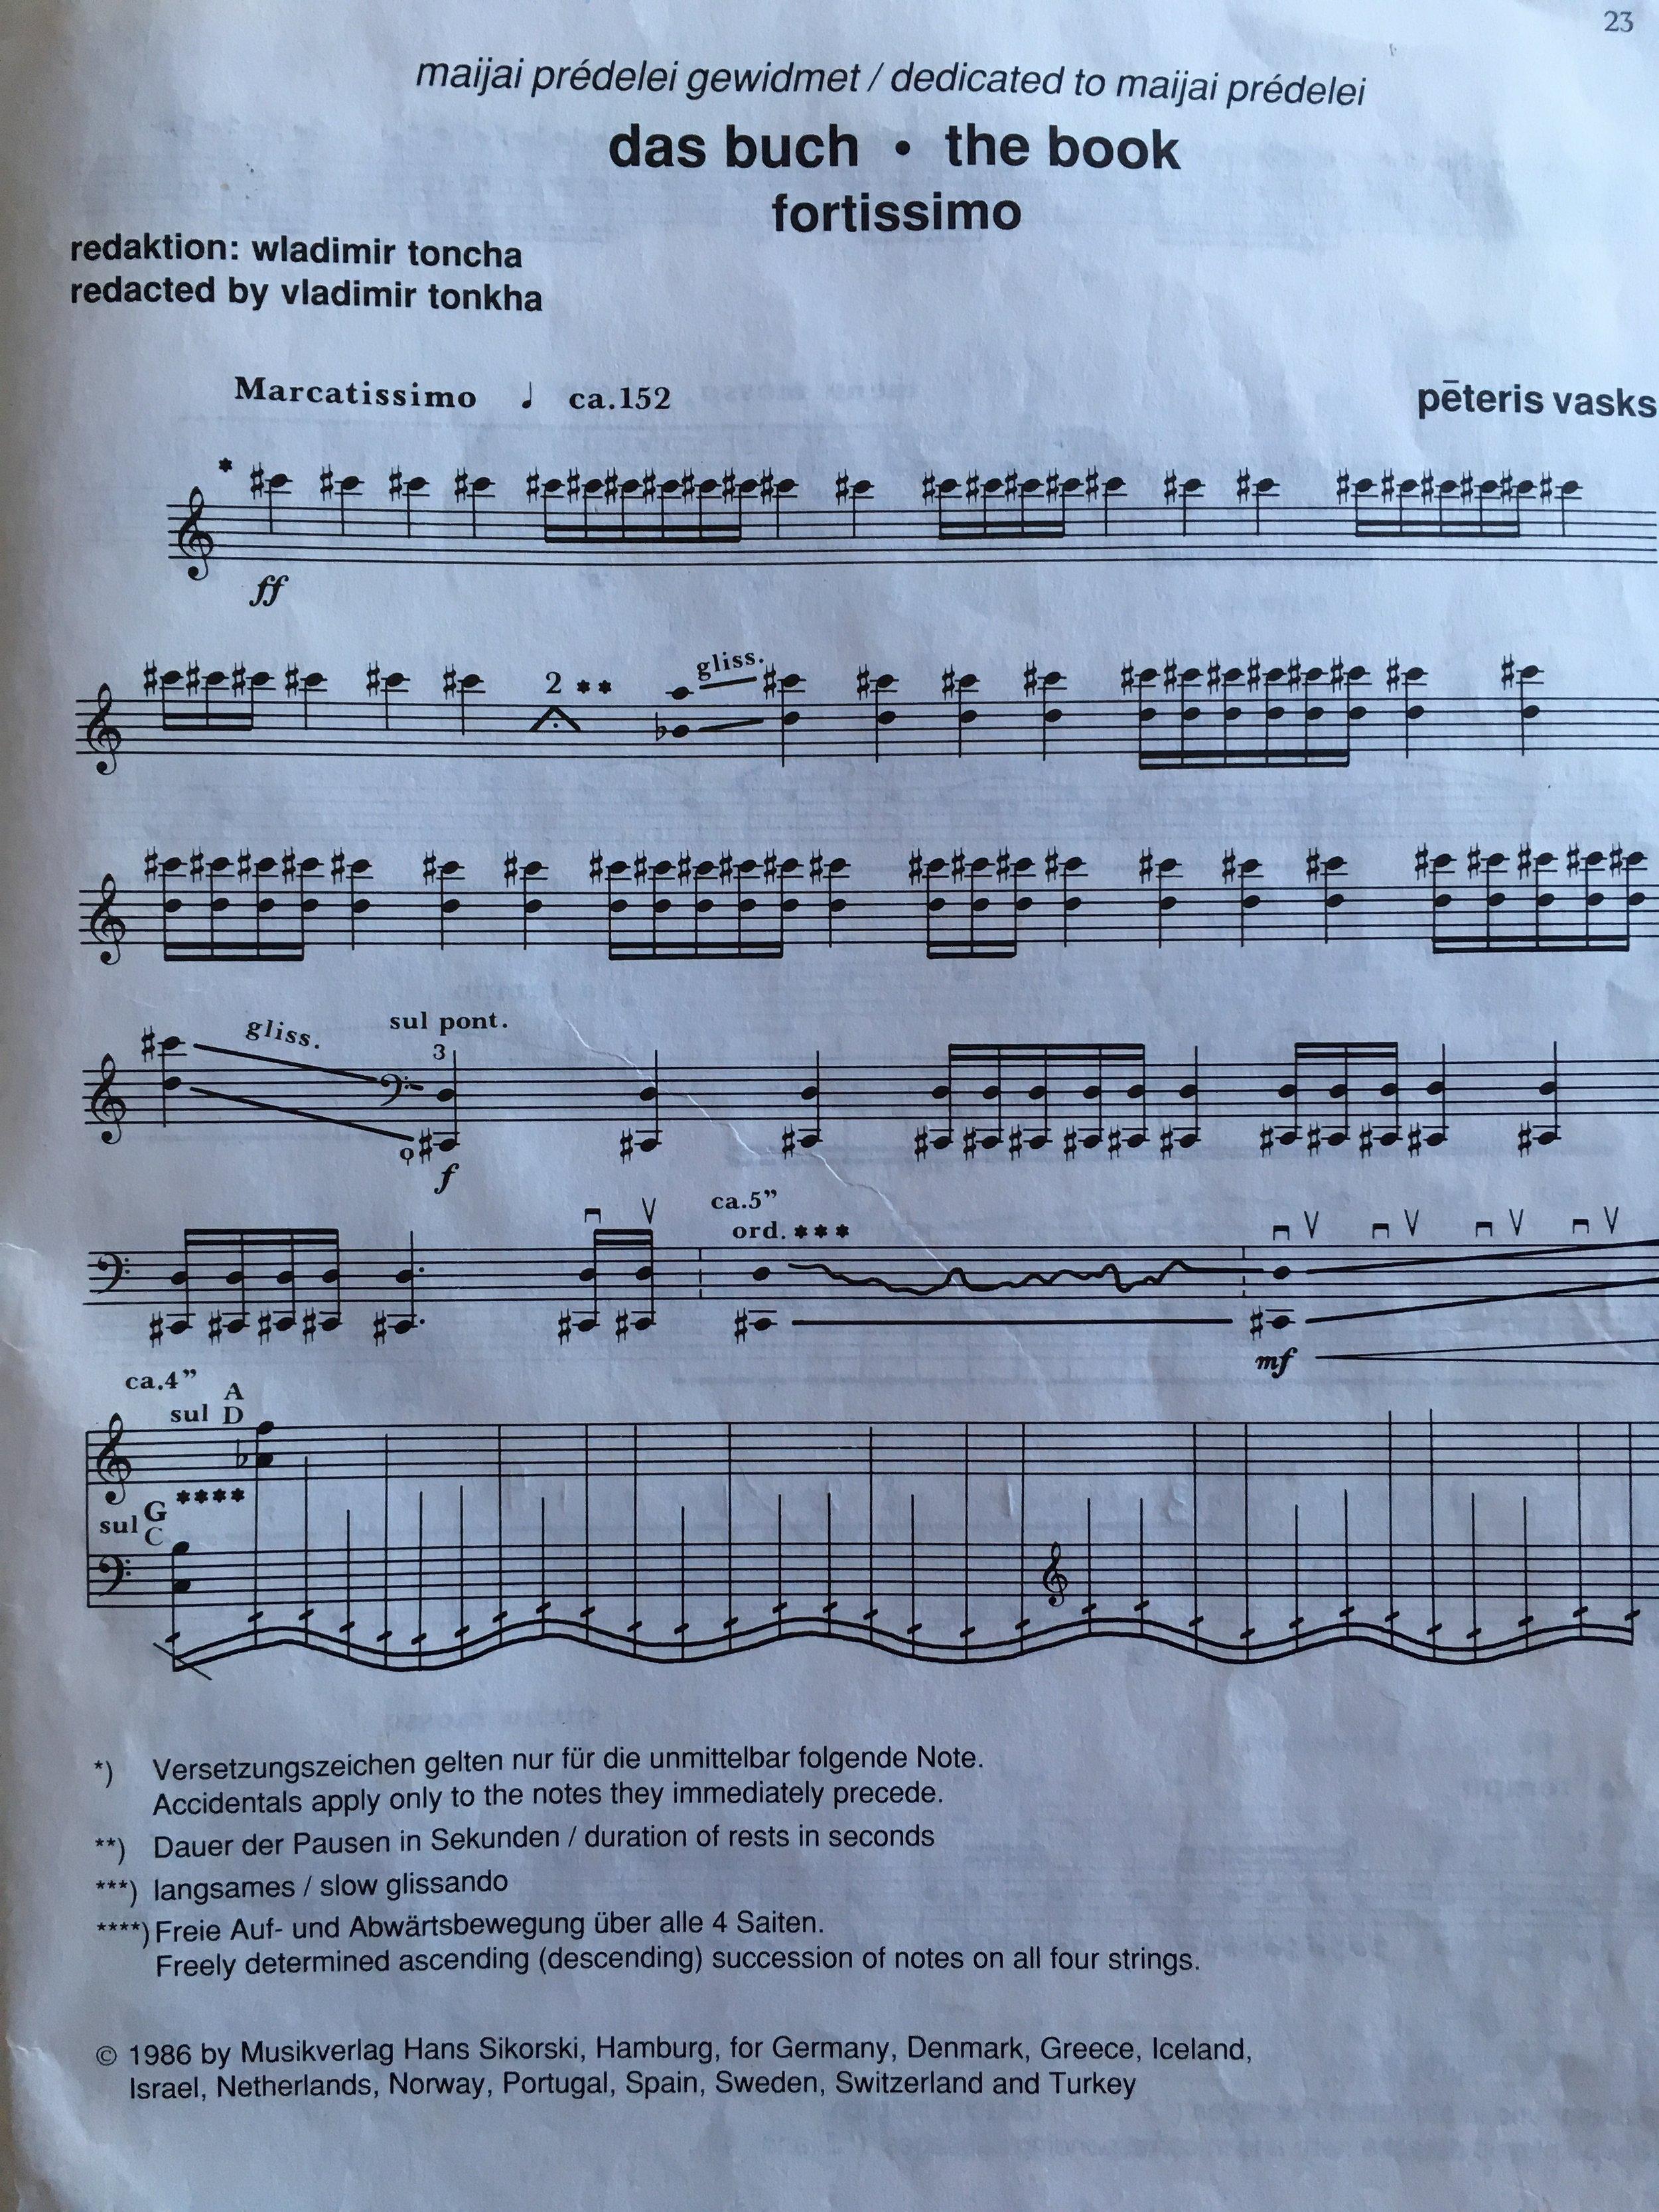 La primera página de 'Gramata cellam' de Peteris Vasks.